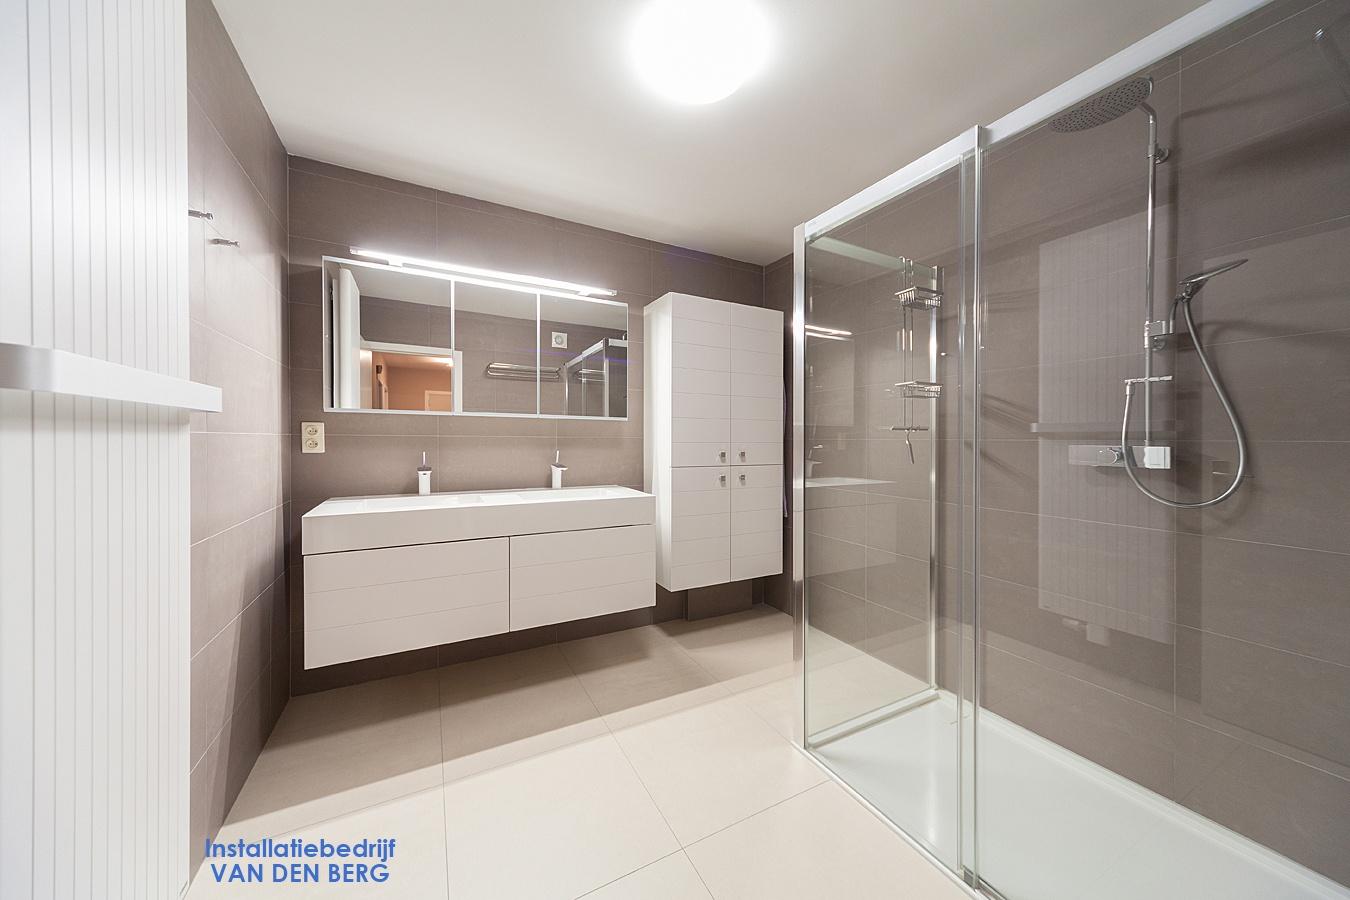 Badkamer Sanitair Belgie : Verwarming sanitair badkamers installatiebedrijf van den berg